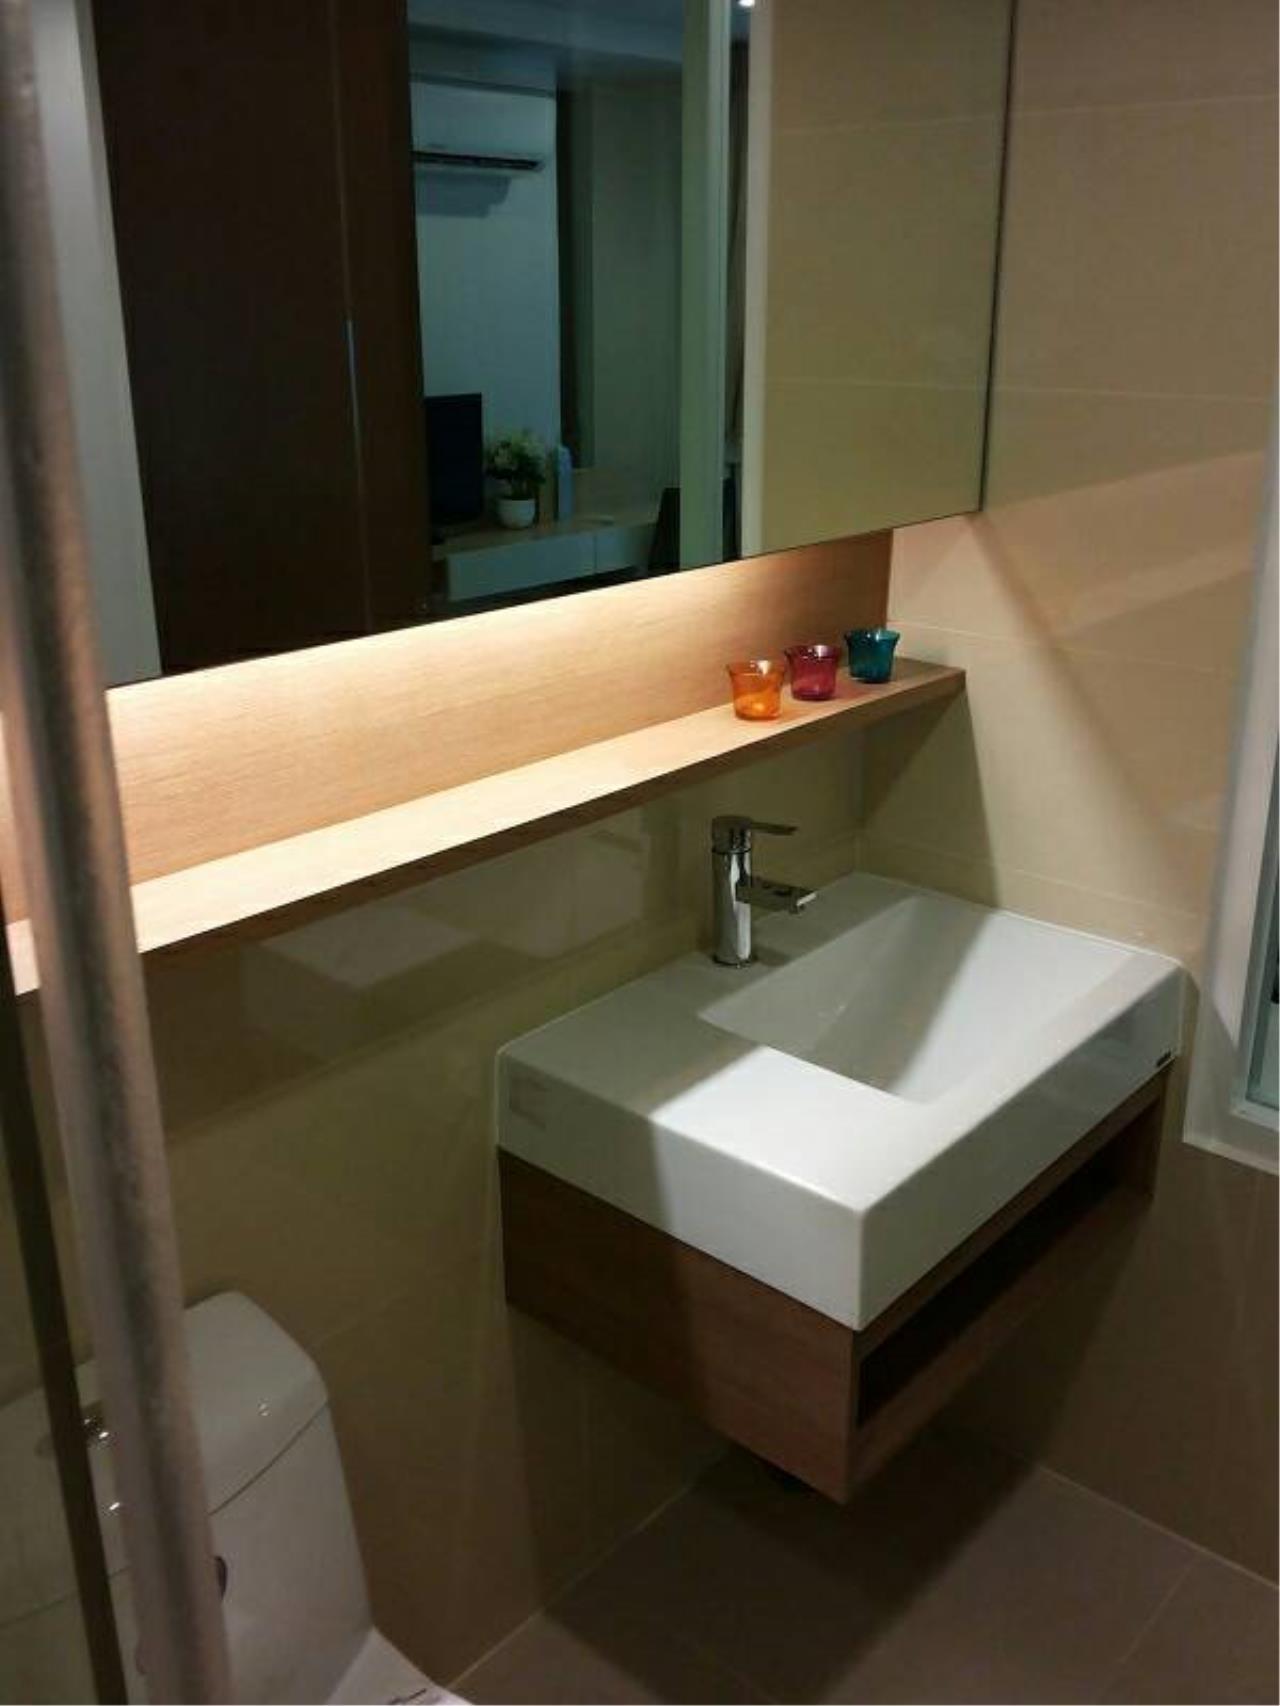 Quality Life Property Agency's FOR RENT! !! 15 SUKHUMVIT RESIDENCES / STUDIO 1 BETHROOM /  10 FLOOR 2